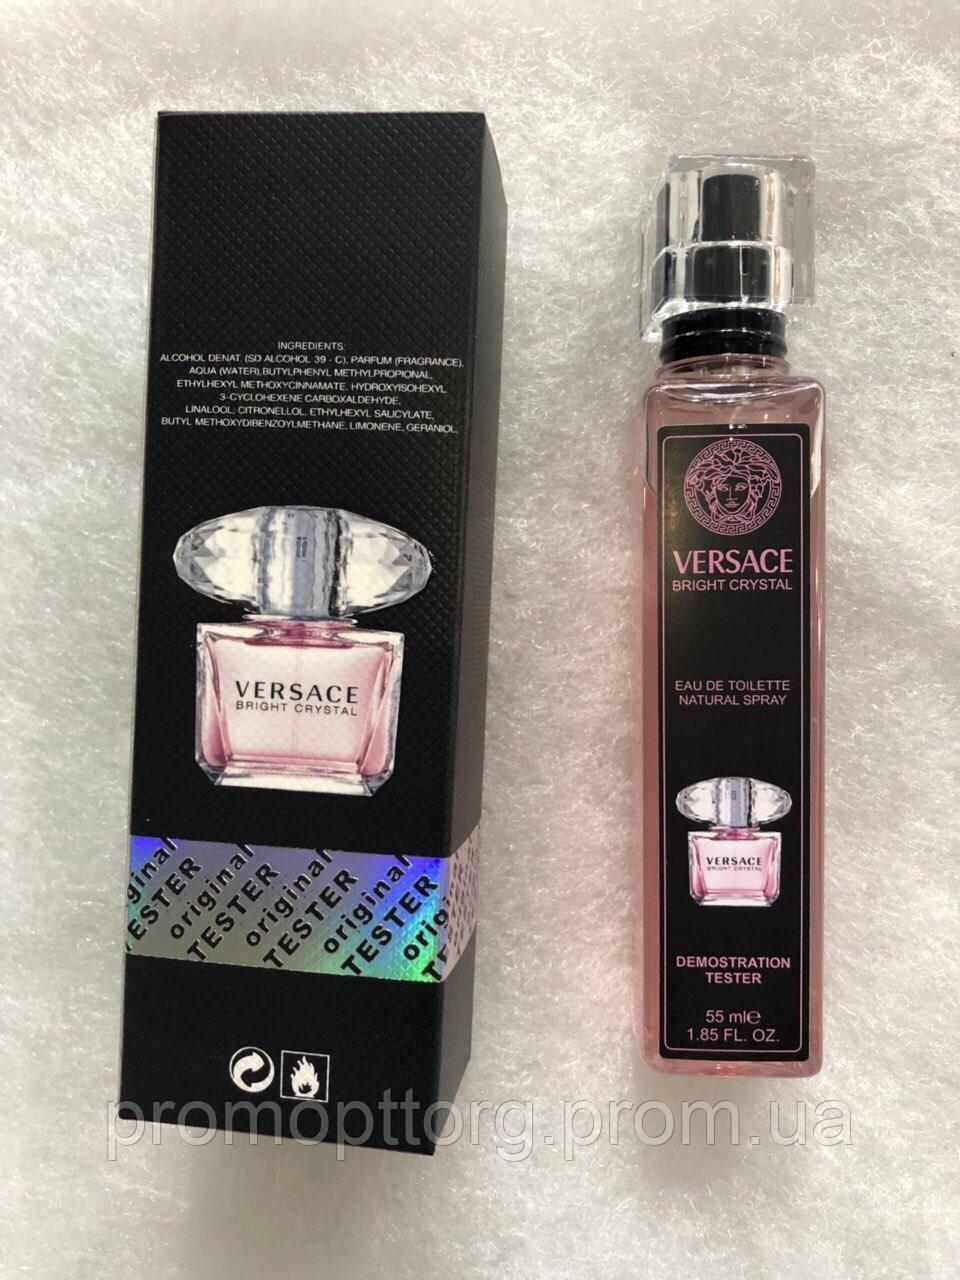 Женский парфюм Versace Bright Crystal тестер 55 ml (реплика)